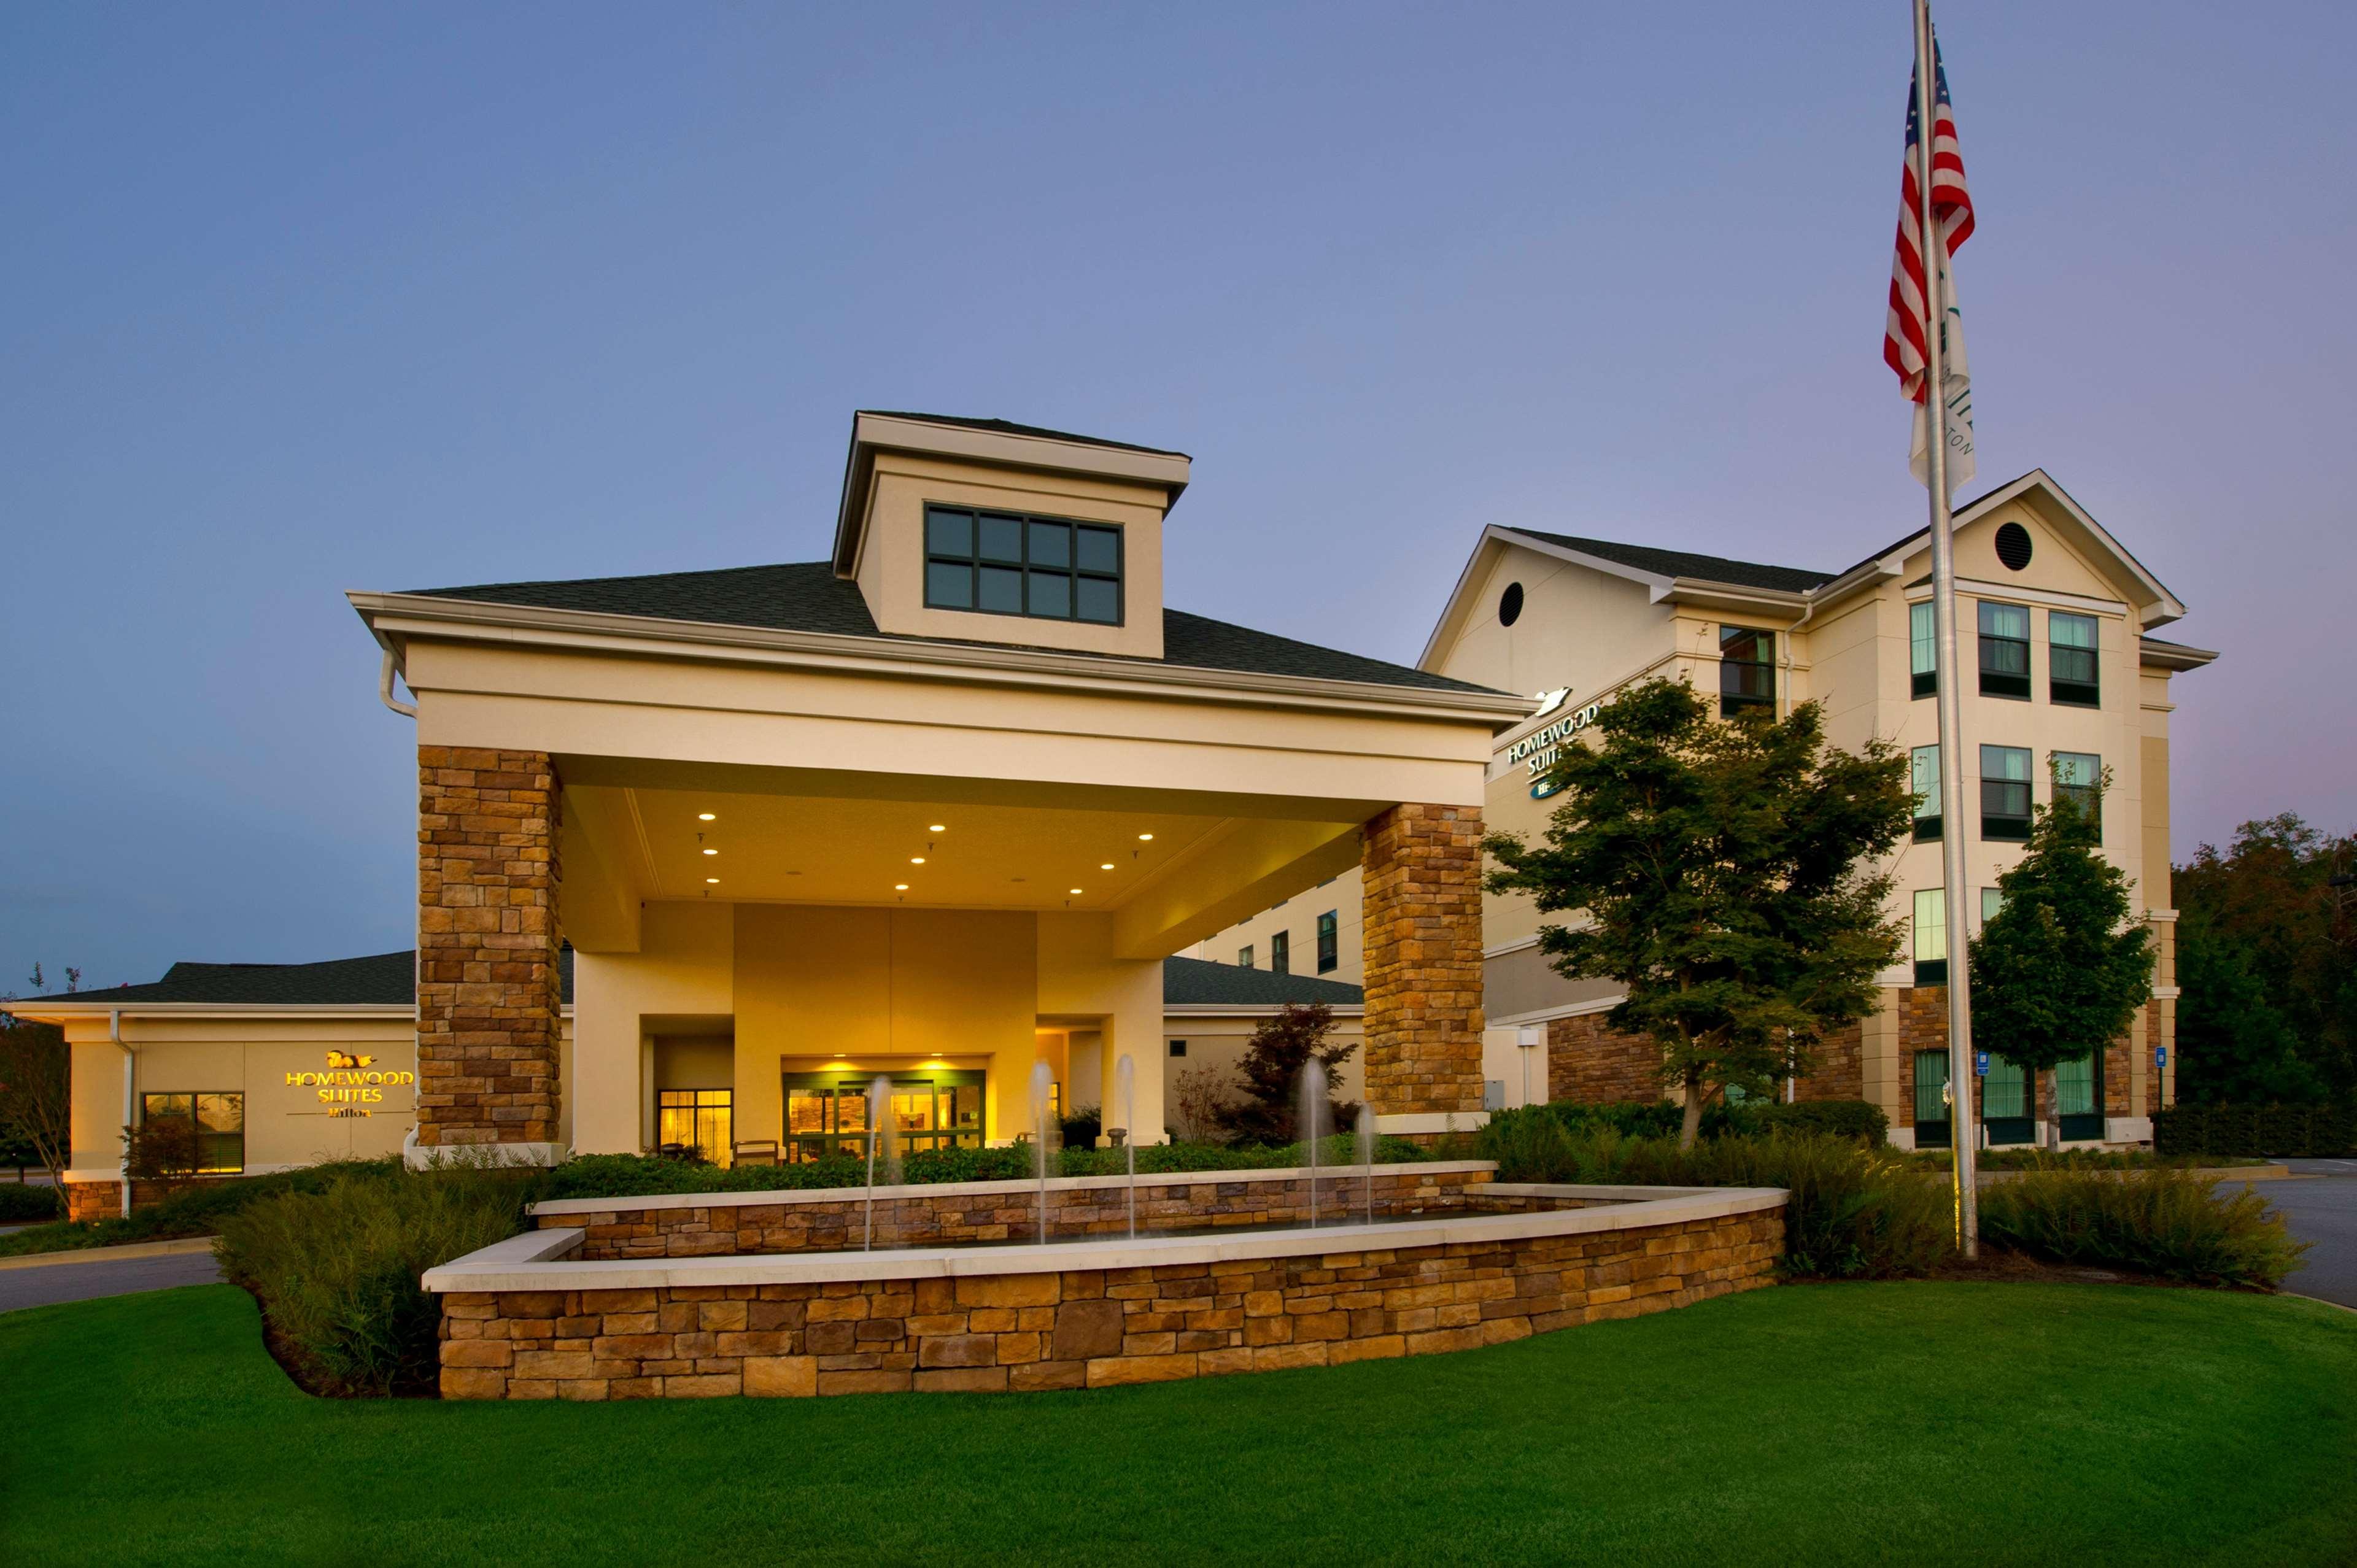 Homewood Suites by Hilton Columbus image 2